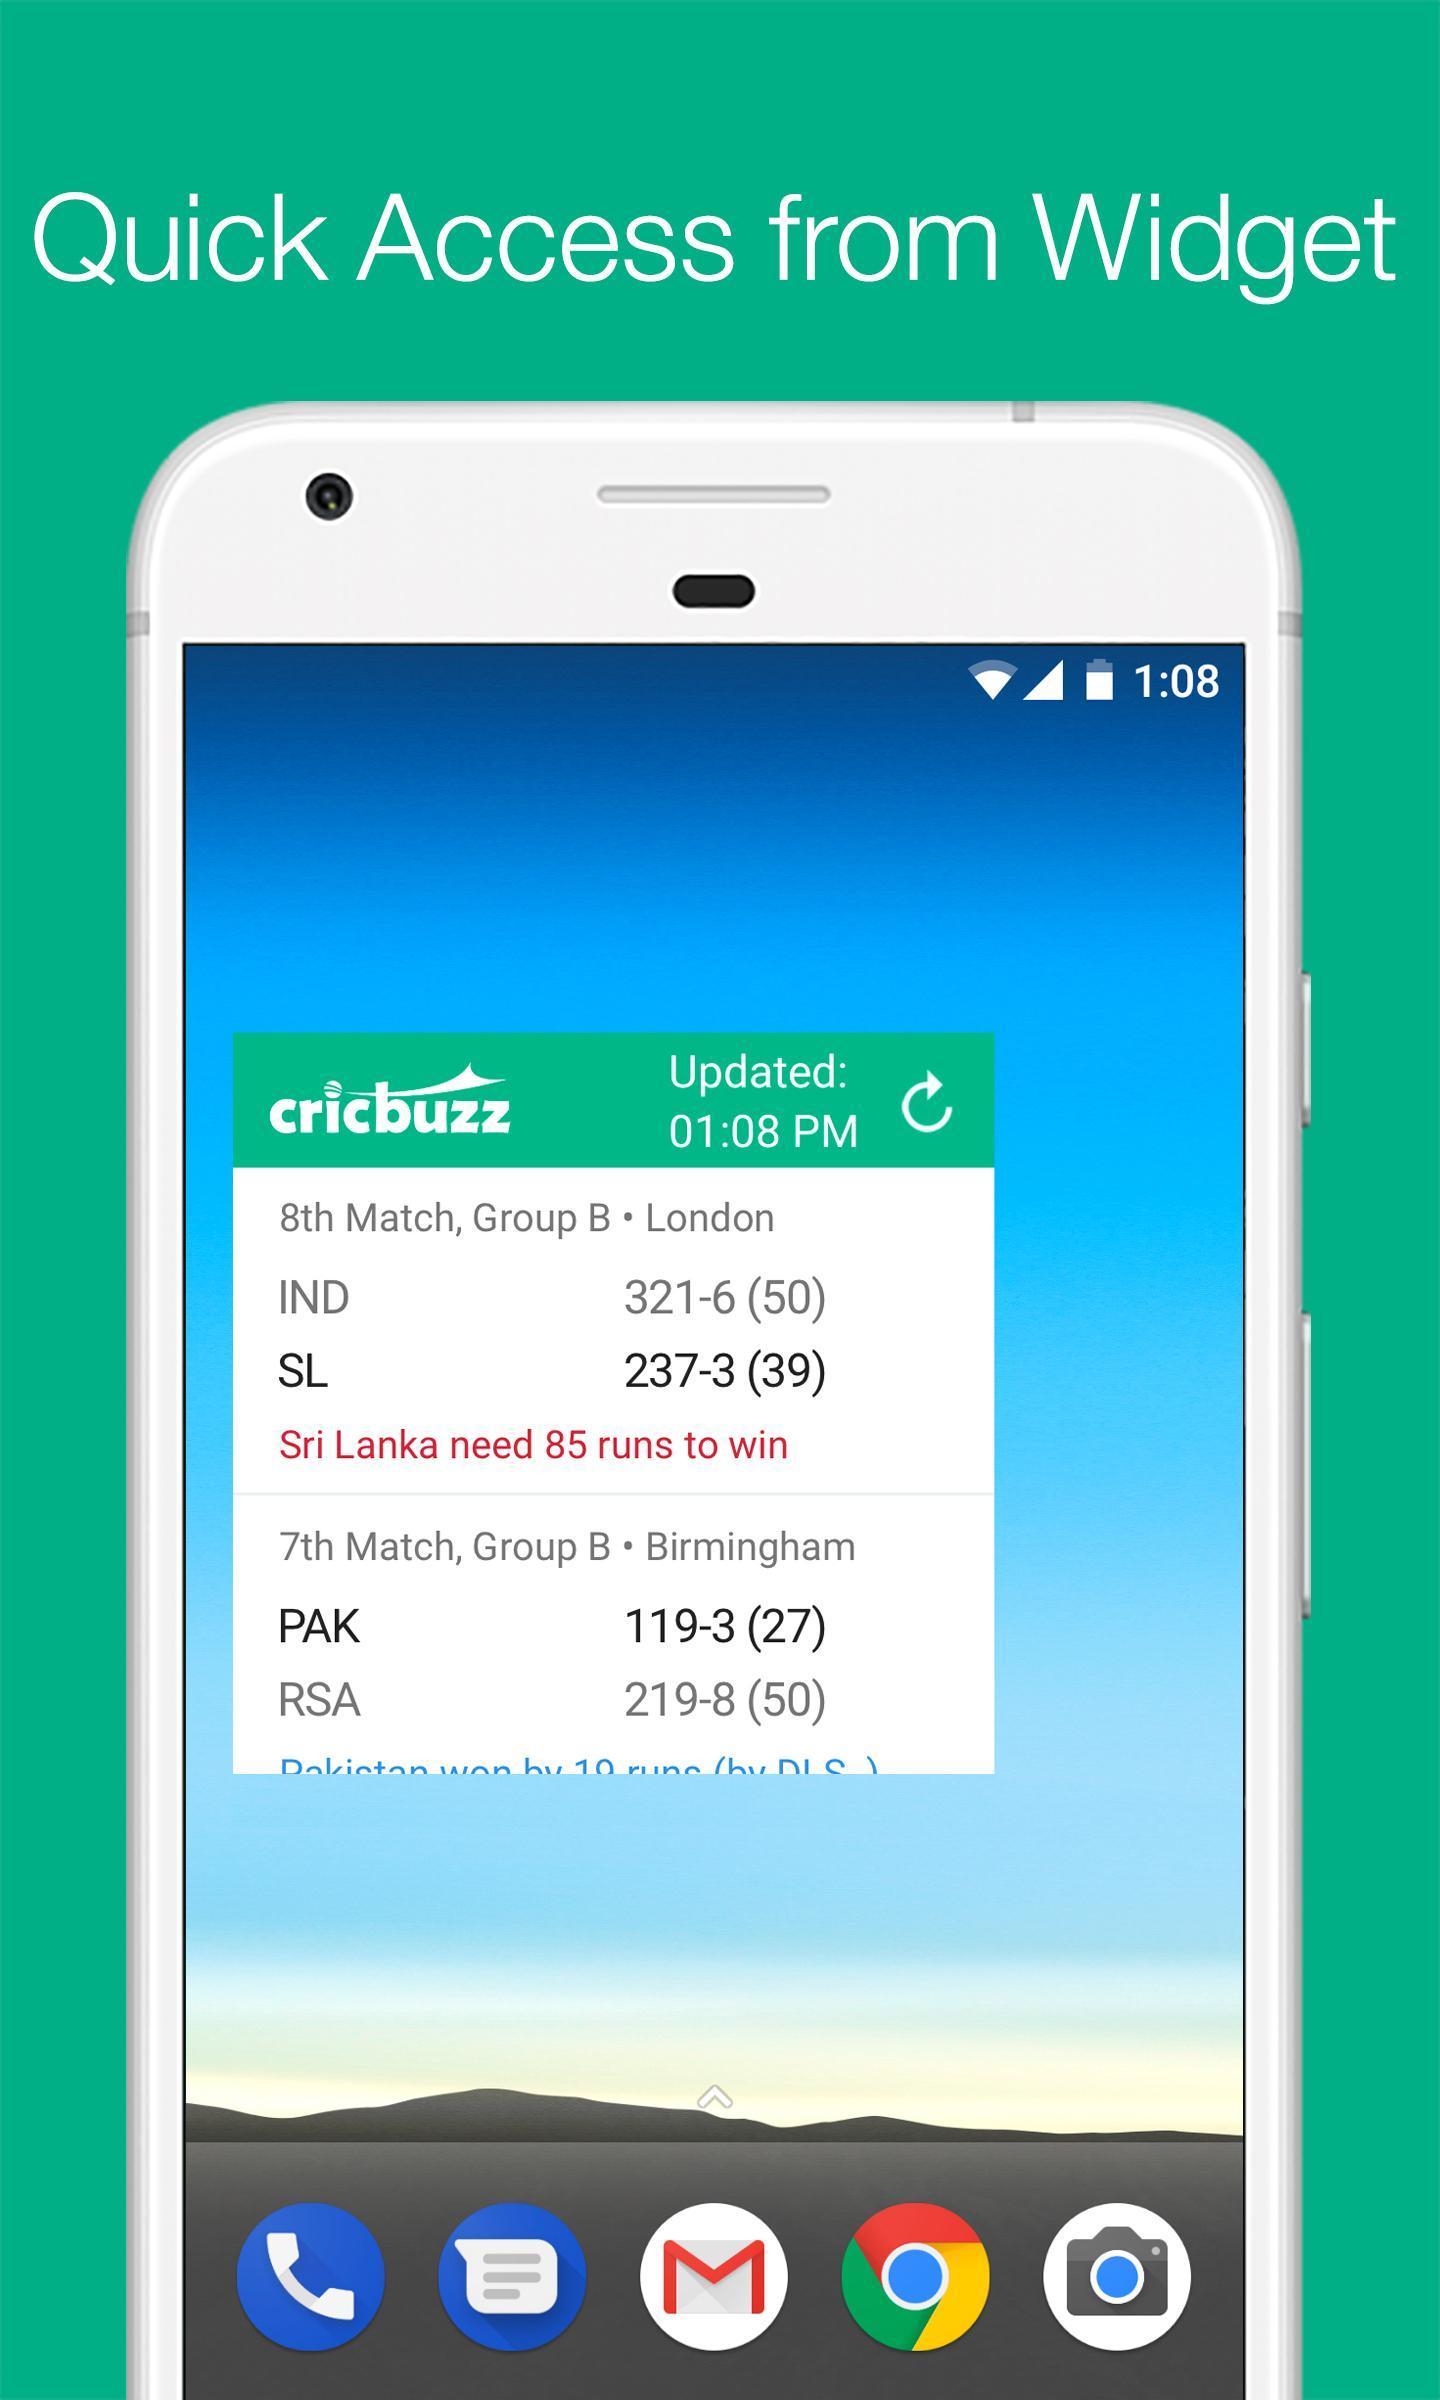 Cricbuzz Live Cricket Scores & News 4.8.003 Screenshot 5